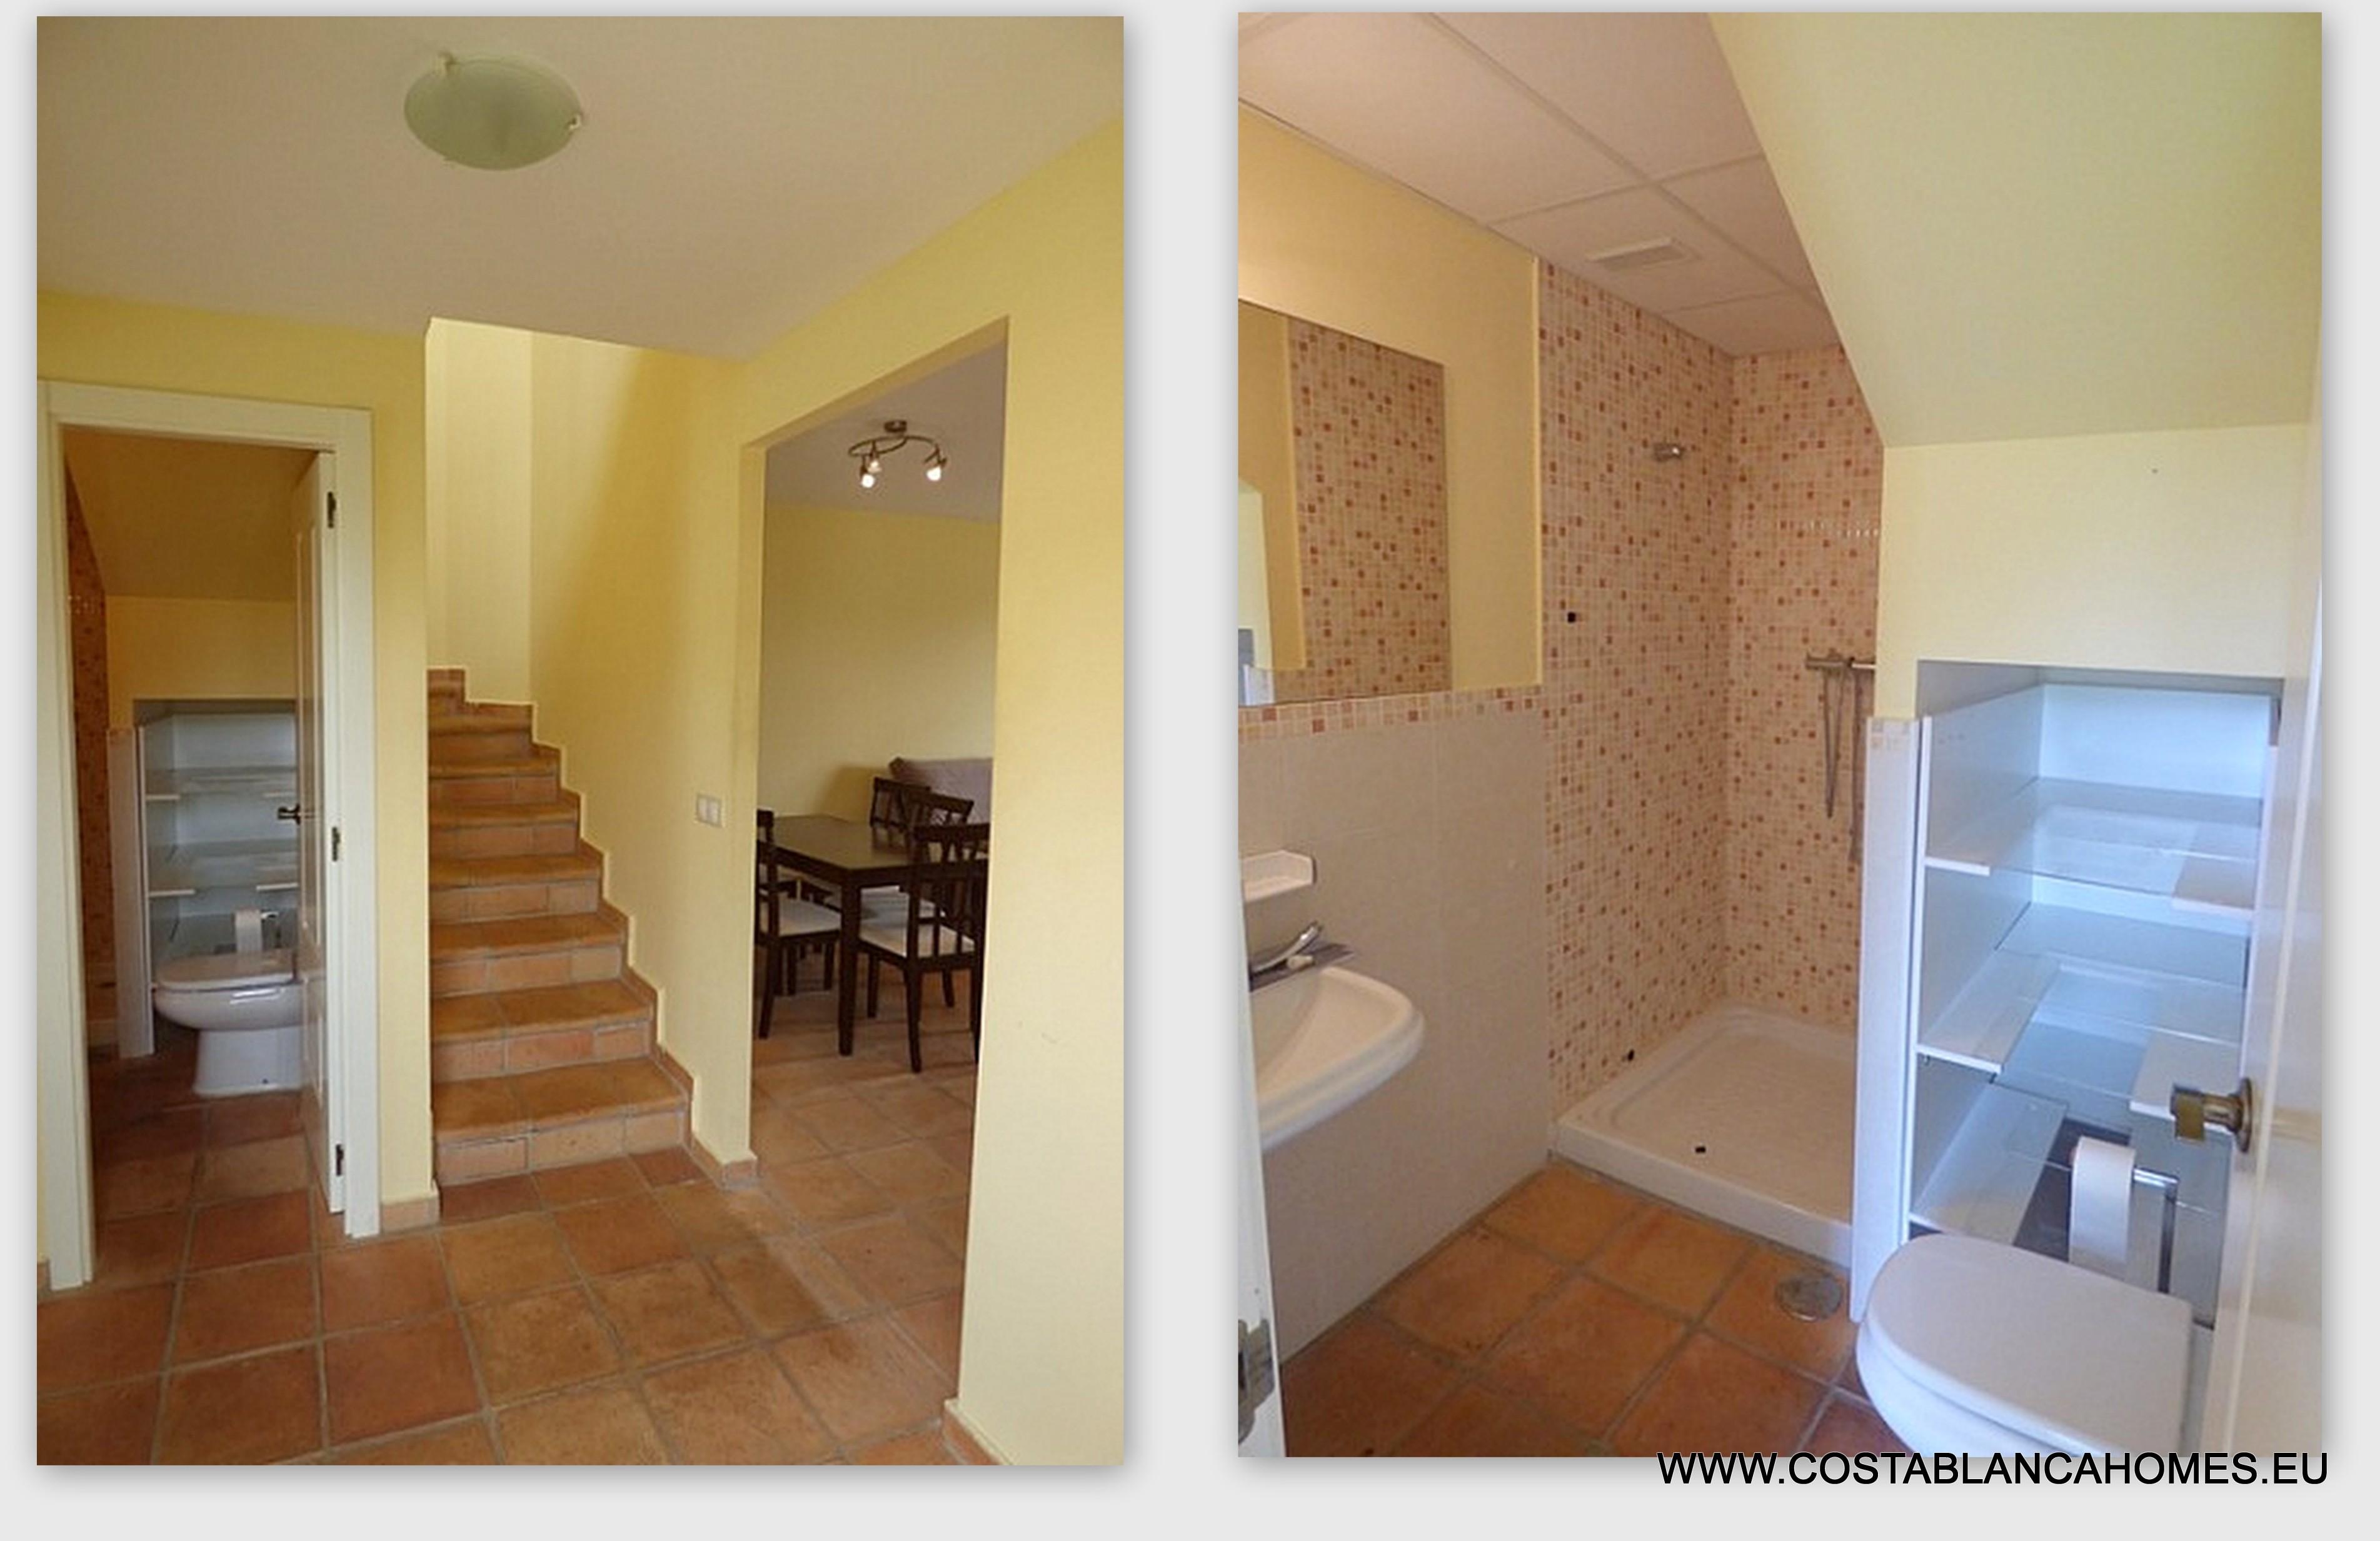 Finestrat townhouse r 183 costa blanca - Vliegtuig badkamer m ...